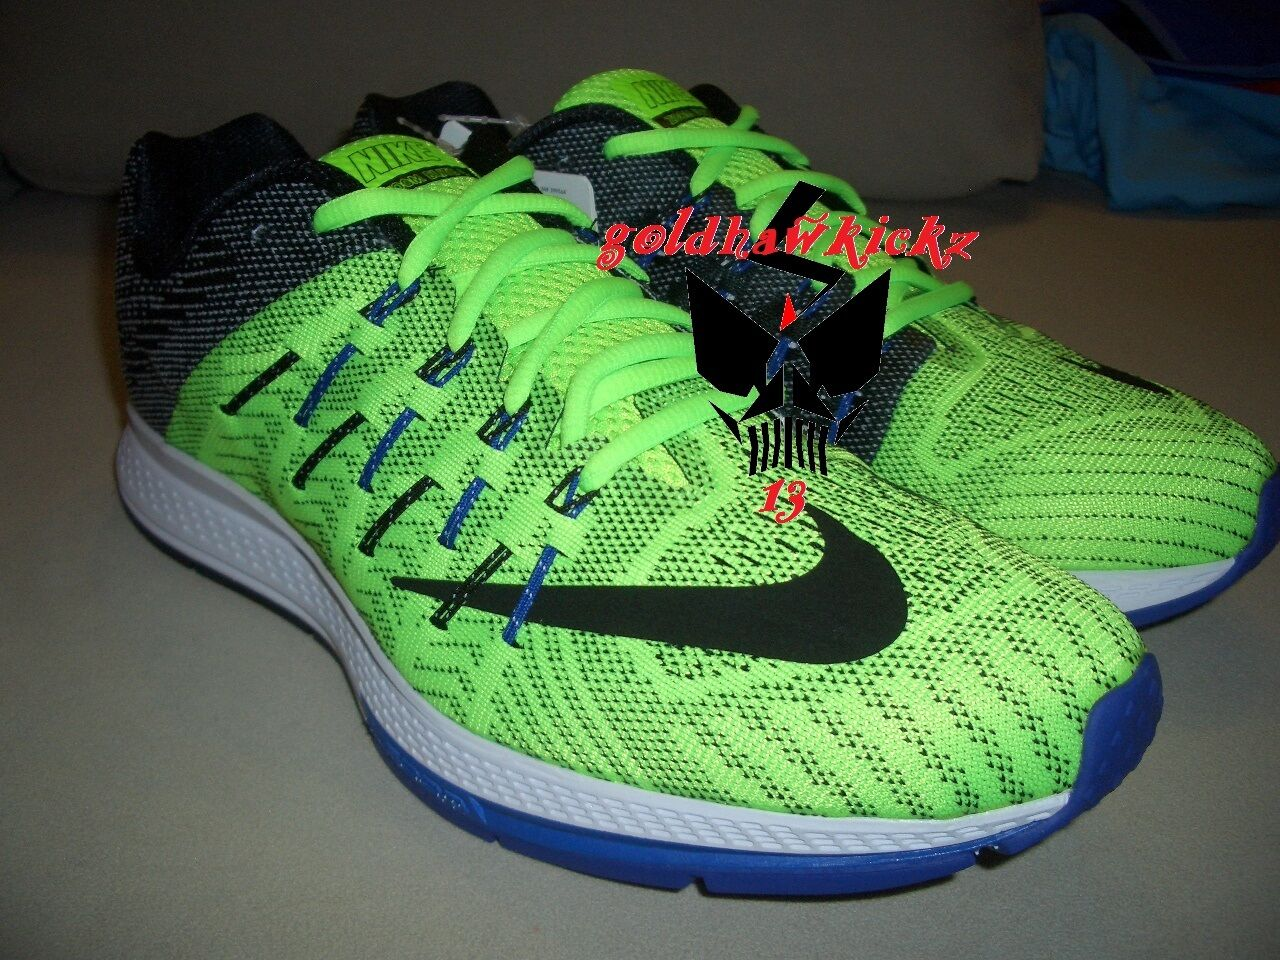 nike zoom elite 8 748588-300 electric green black white concord men running